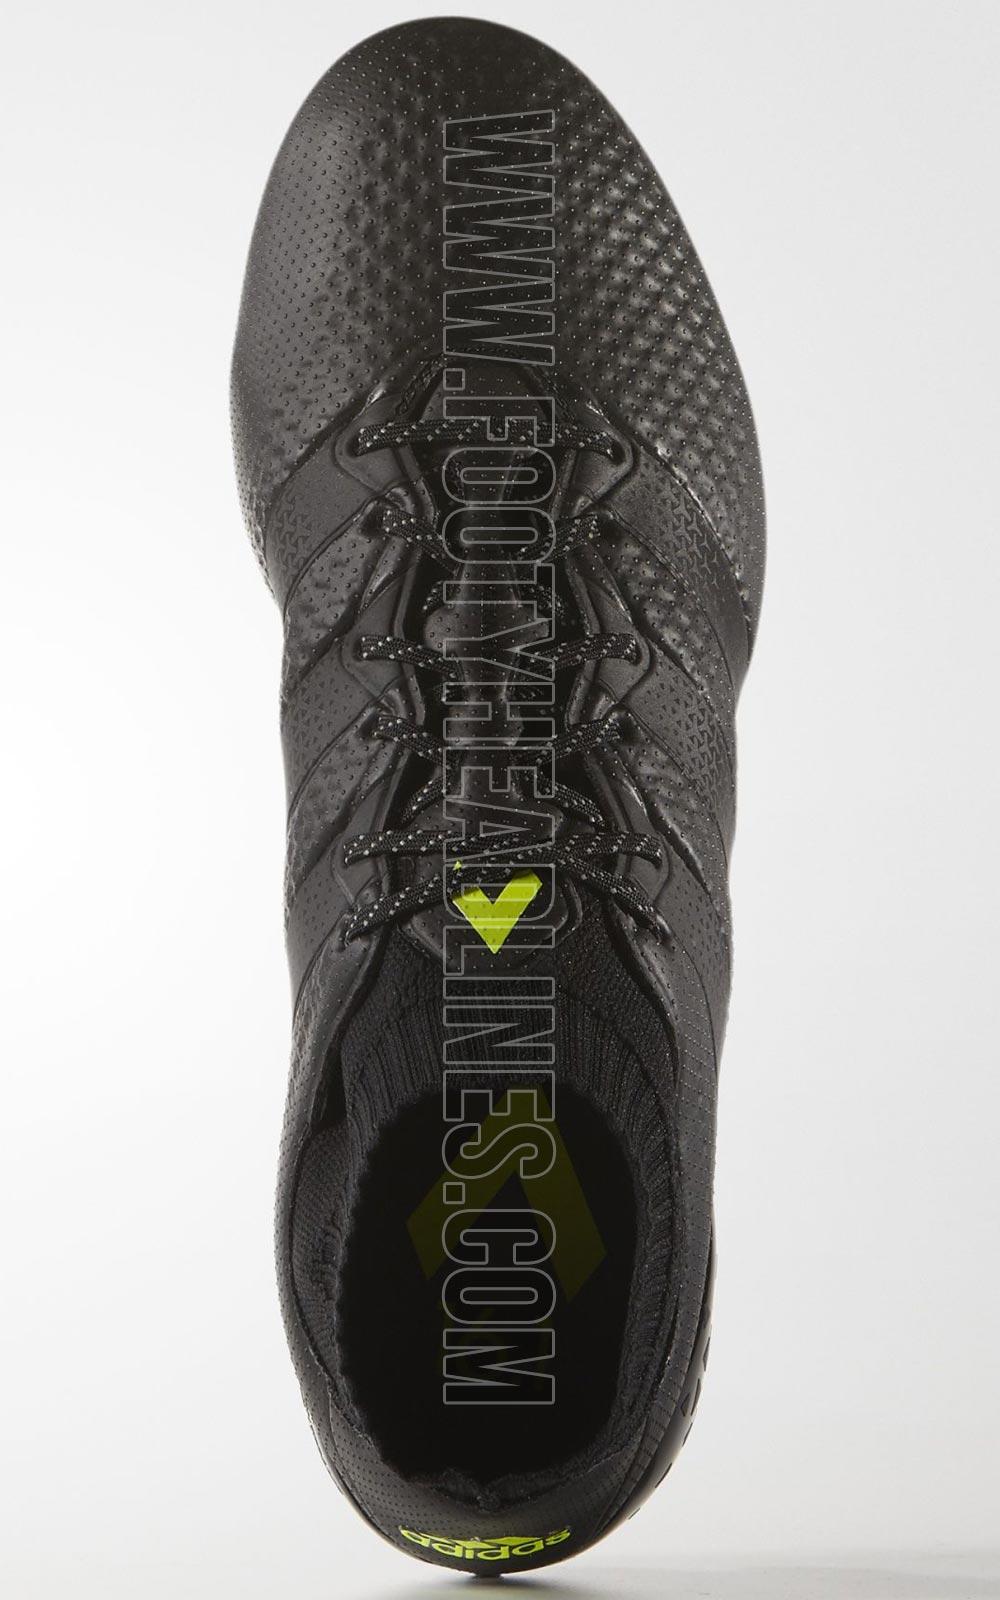 ace blackout boots 1ef7a9946